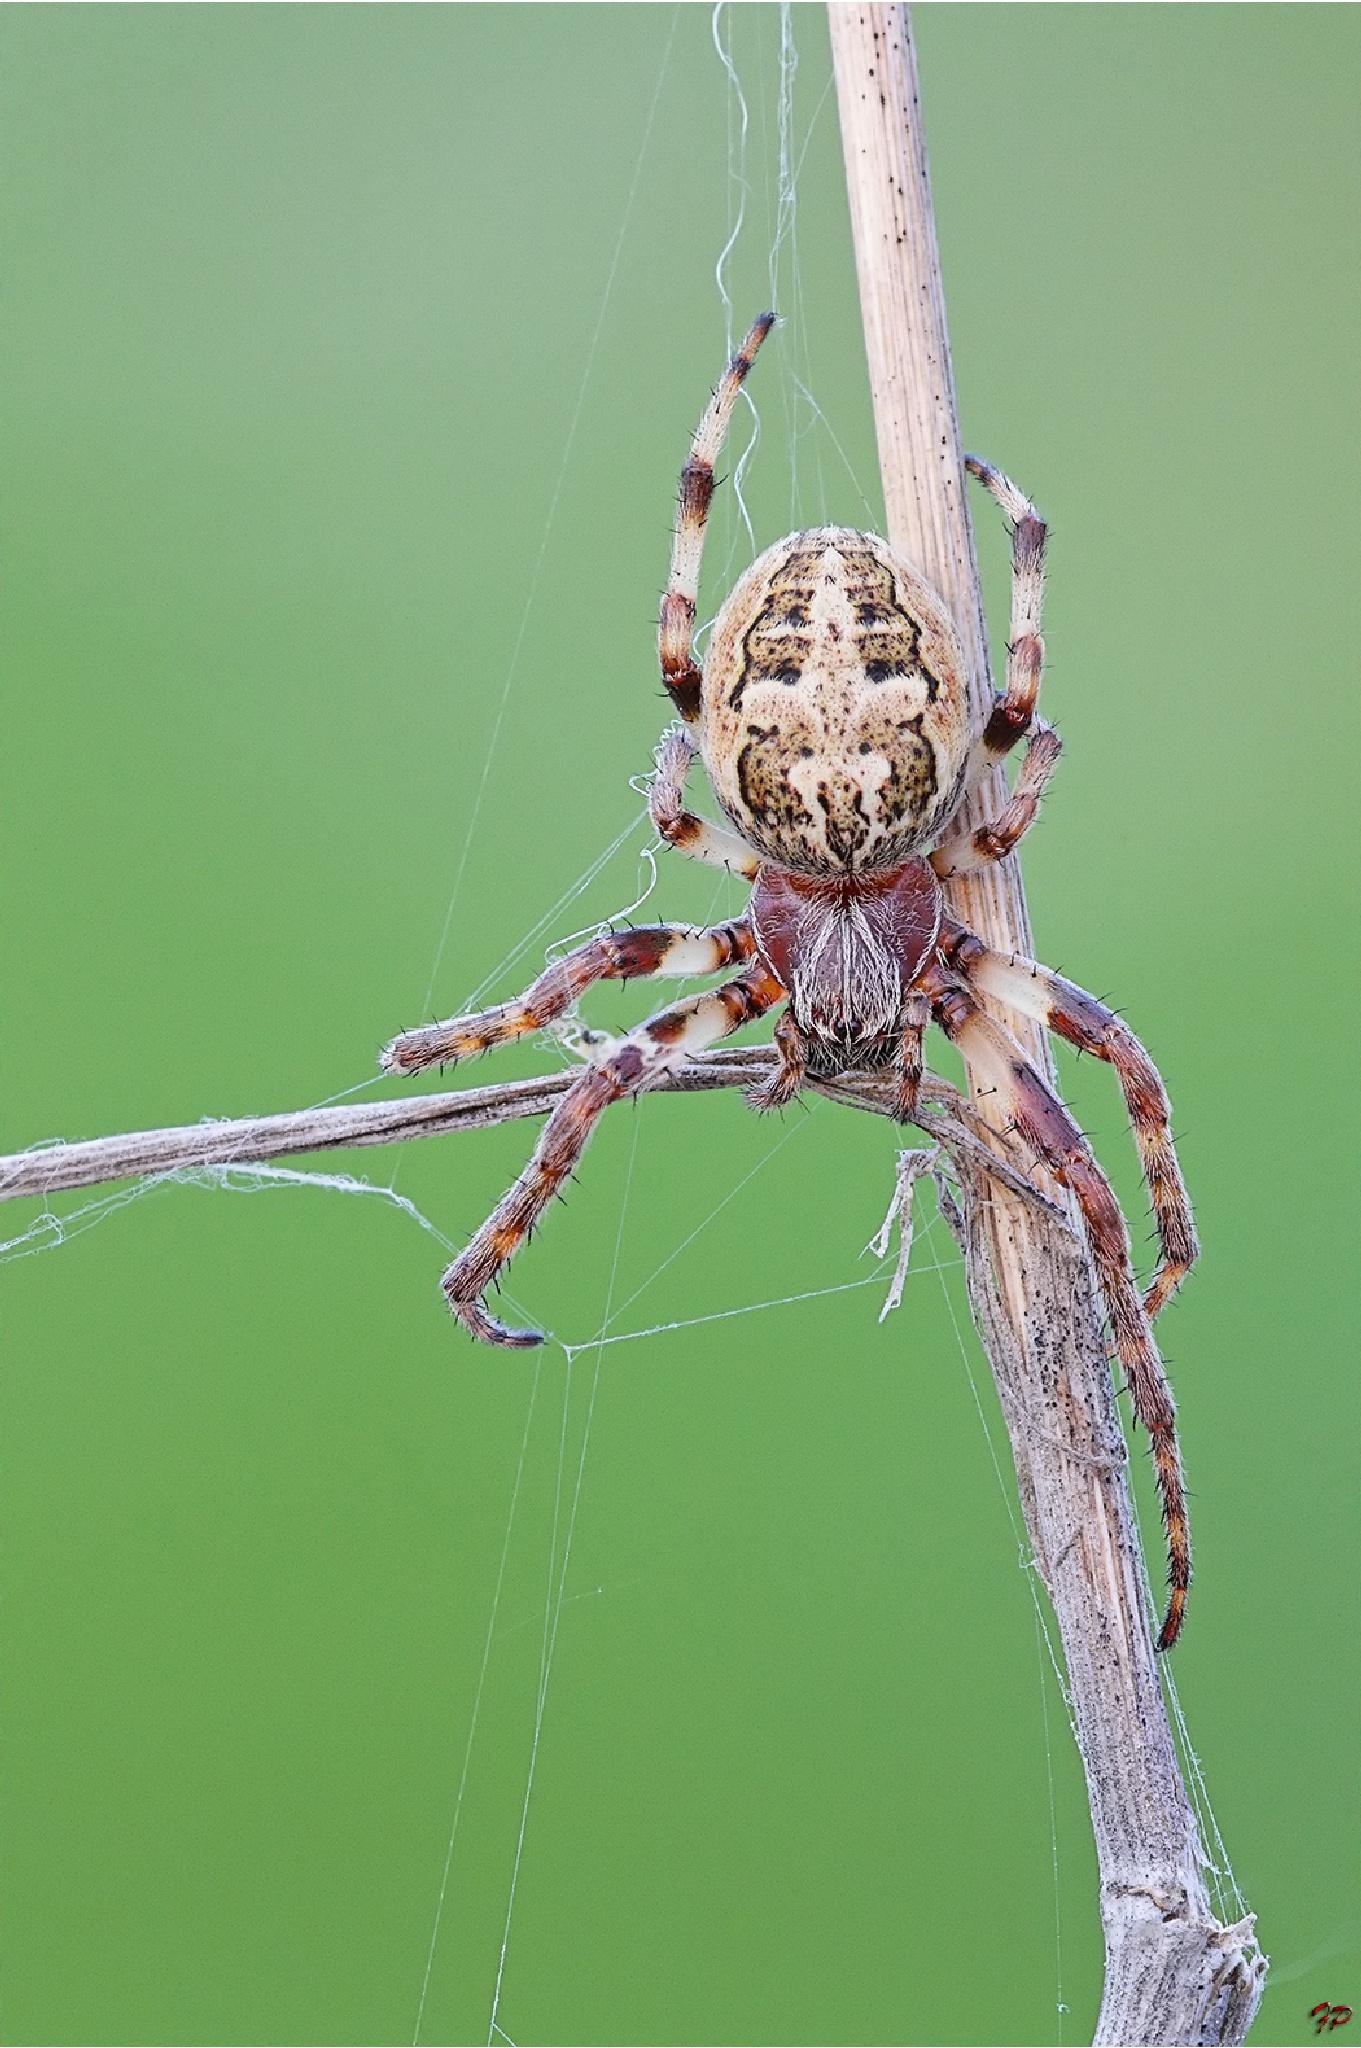 Spider by Fabio Pisciotta